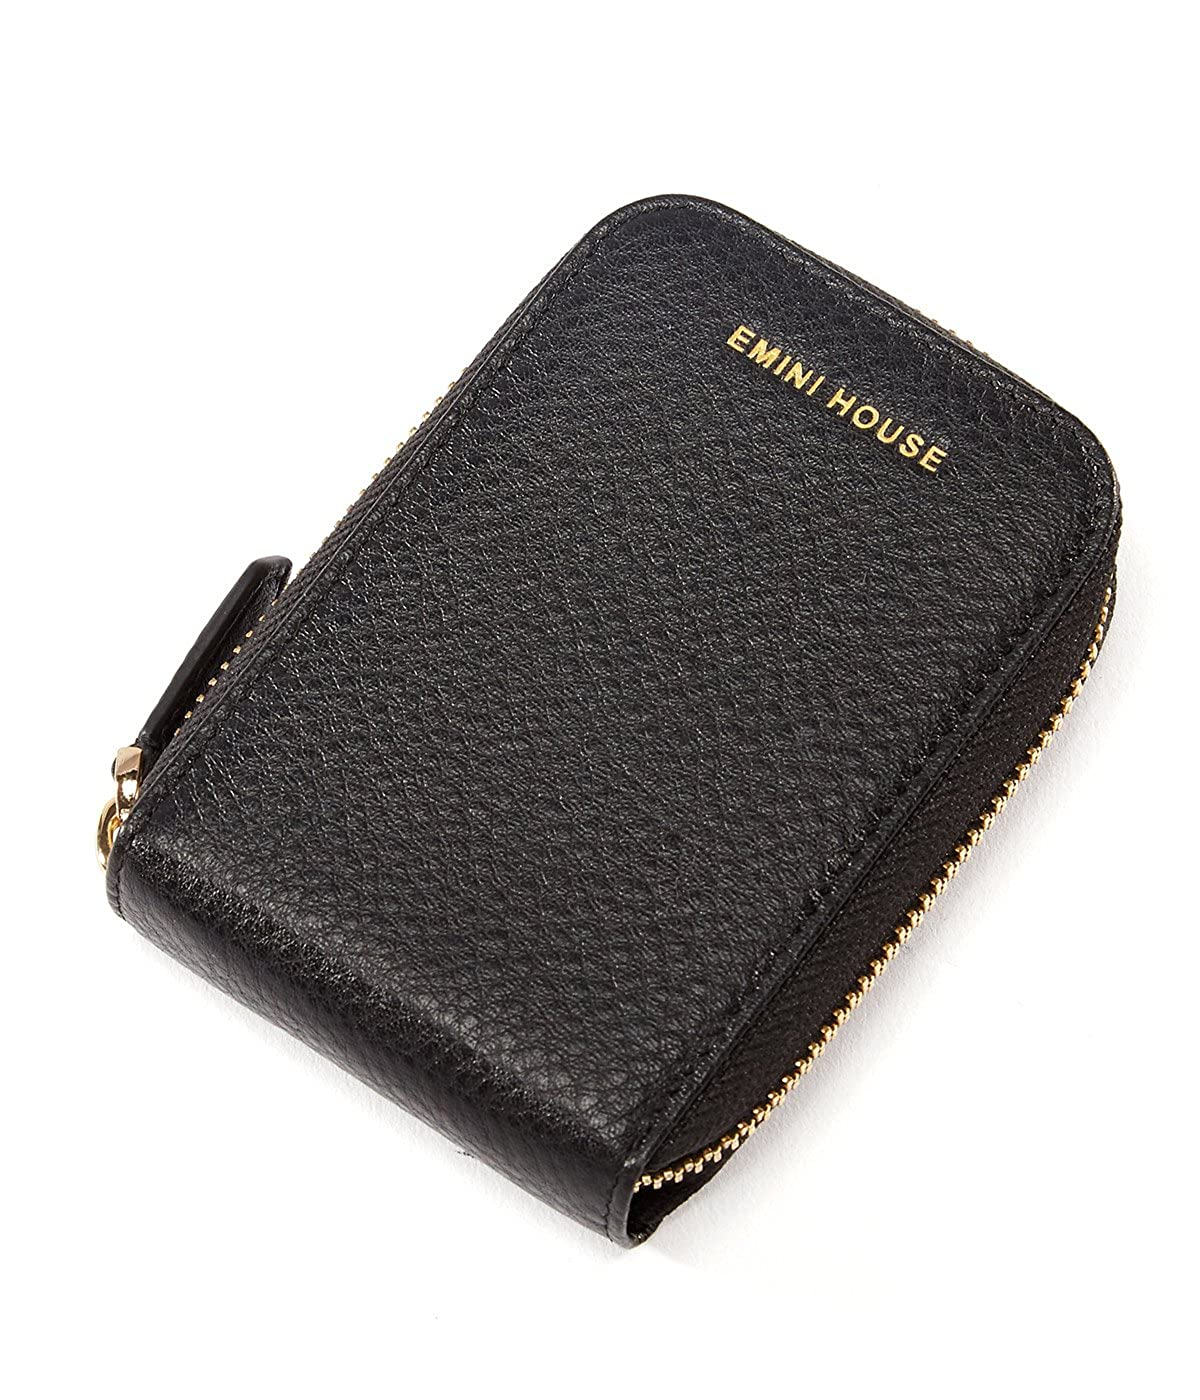 Emini家本革クレジットカードホルダージッパー開閉大容量カードケース  ブラック B071SFR6WK